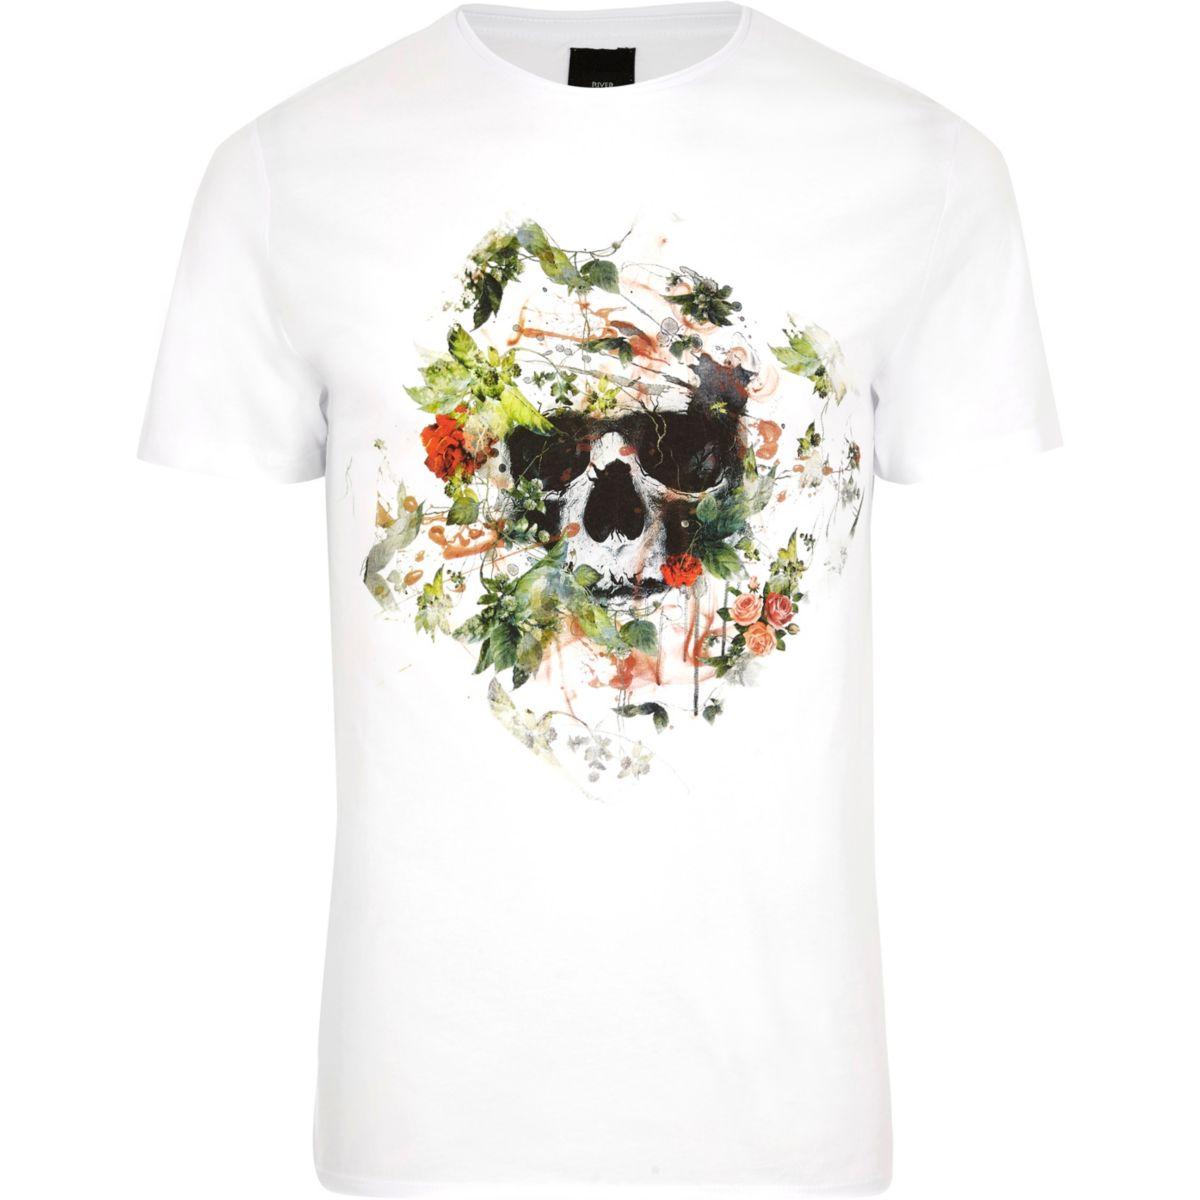 T shirt slim fit white - White Skull Floral Print Slim Fit T Shirt